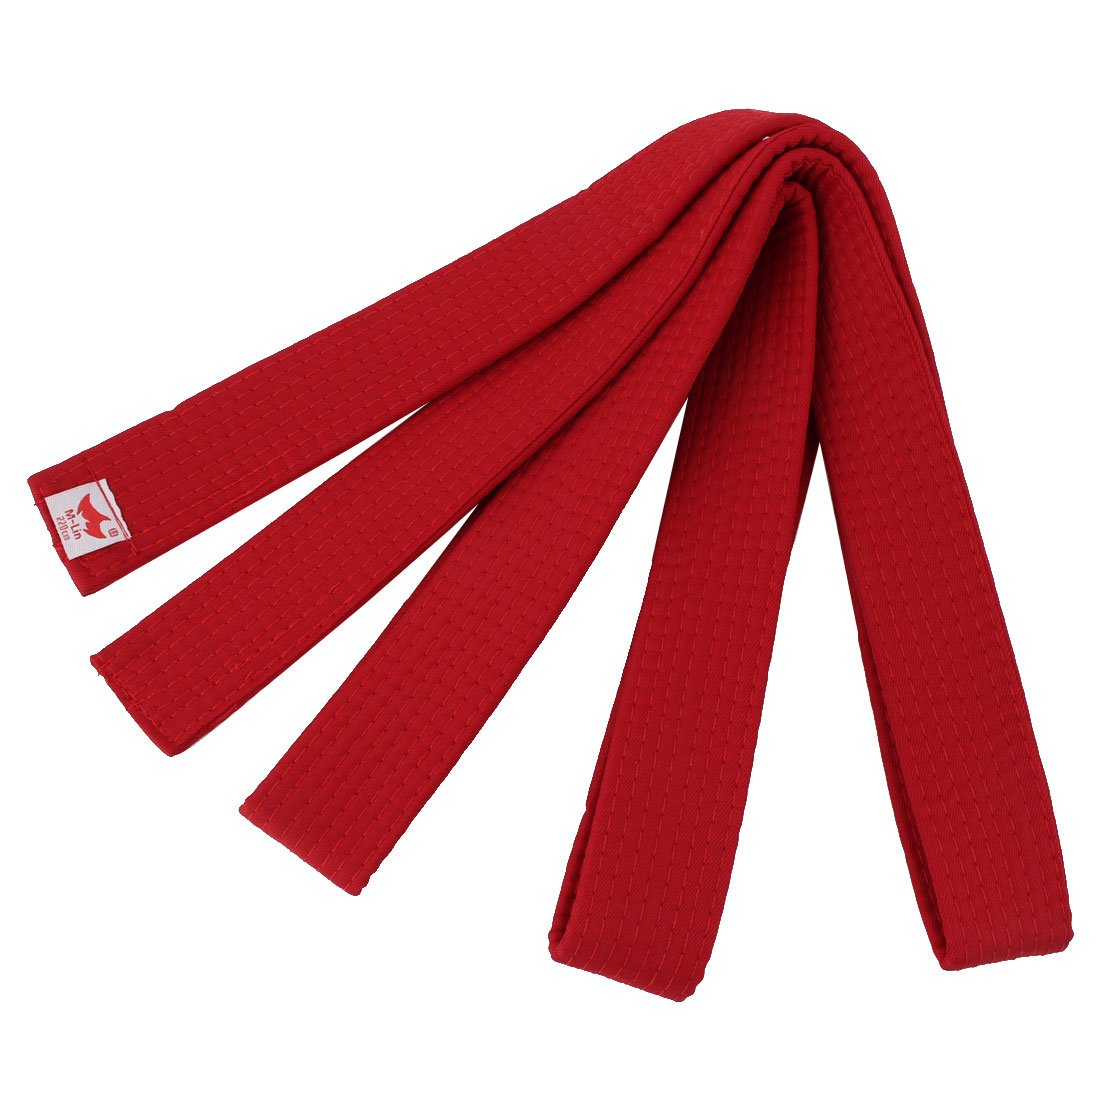 uxcellCotton Blend Master Martial Arts Kendo Karate Taekwondo Uniform Sporty Band Belt 220cm Length Blue a17052900ux0917